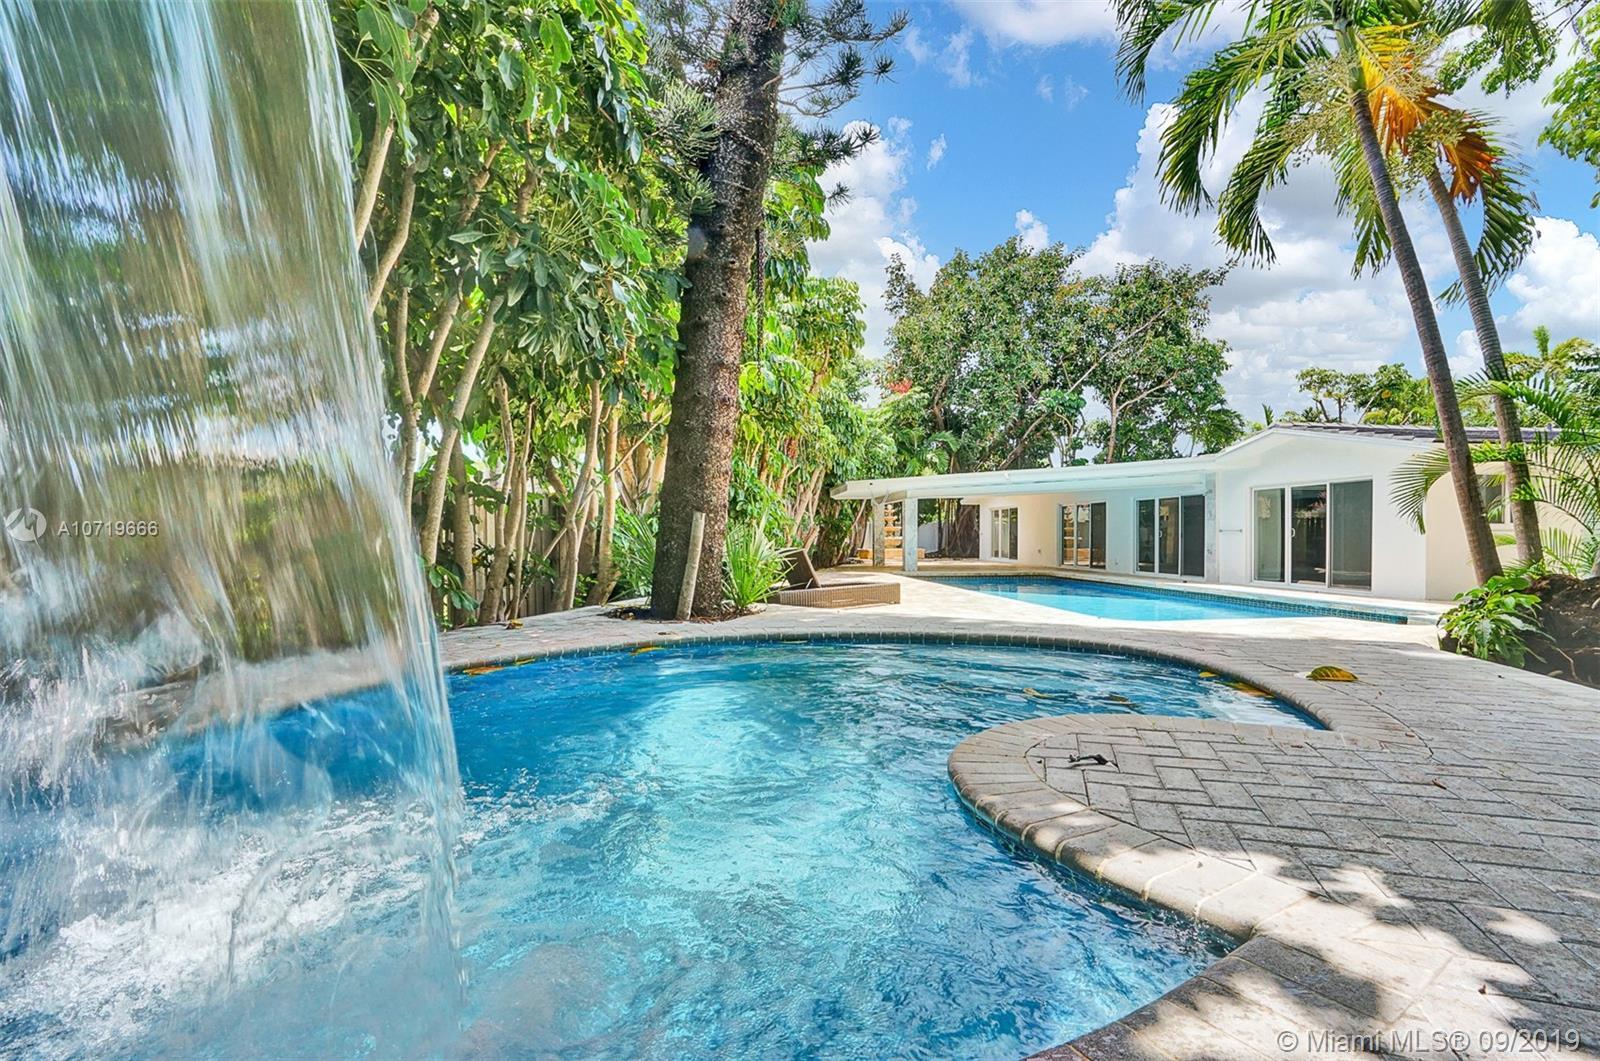 1800 SE 24 Ave (Admirals Way), Fort Lauderdale, FL 33316